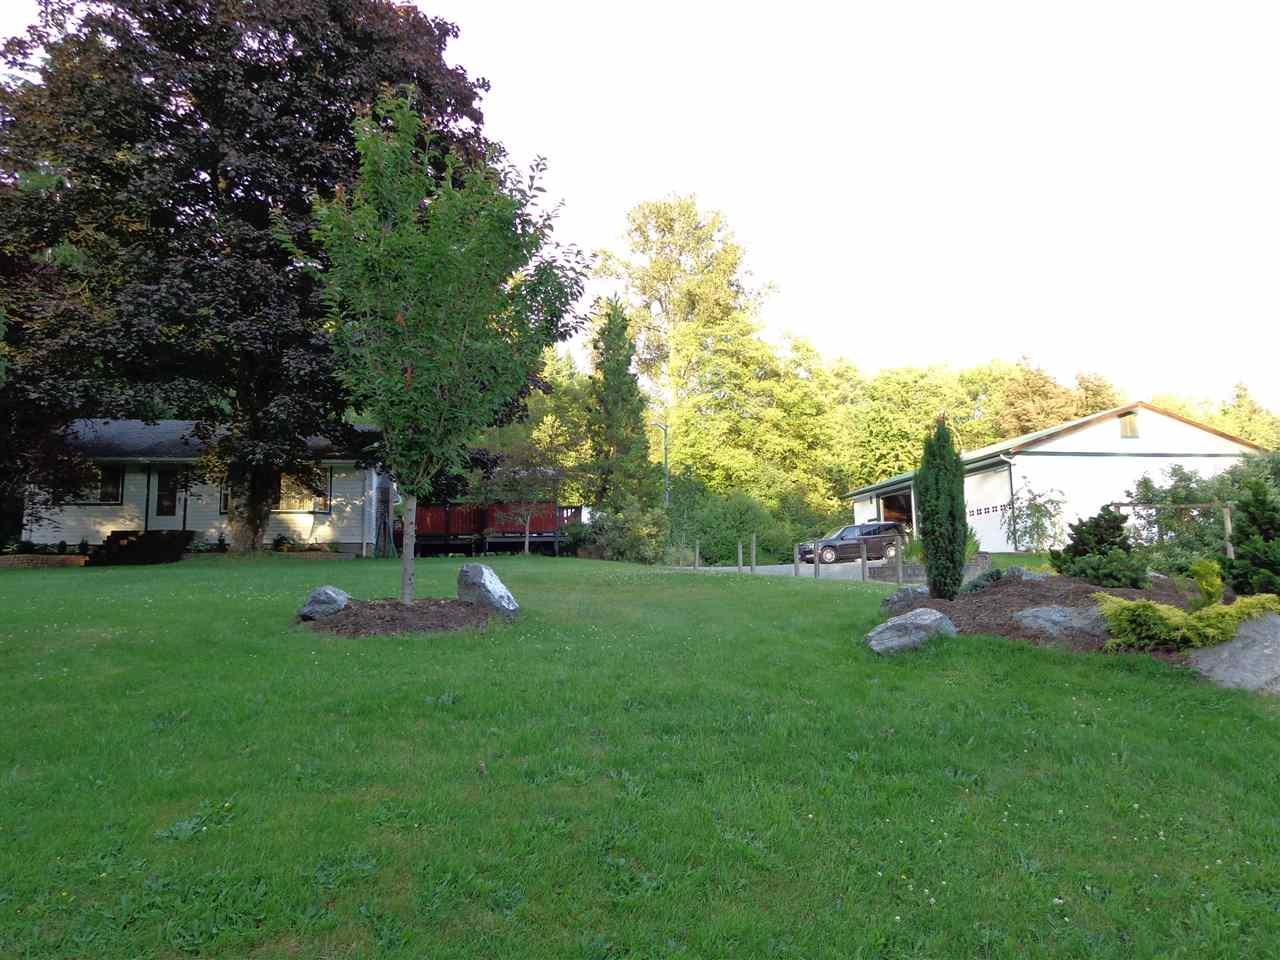 Detached at 4934 232 STREET, Langley, British Columbia. Image 1